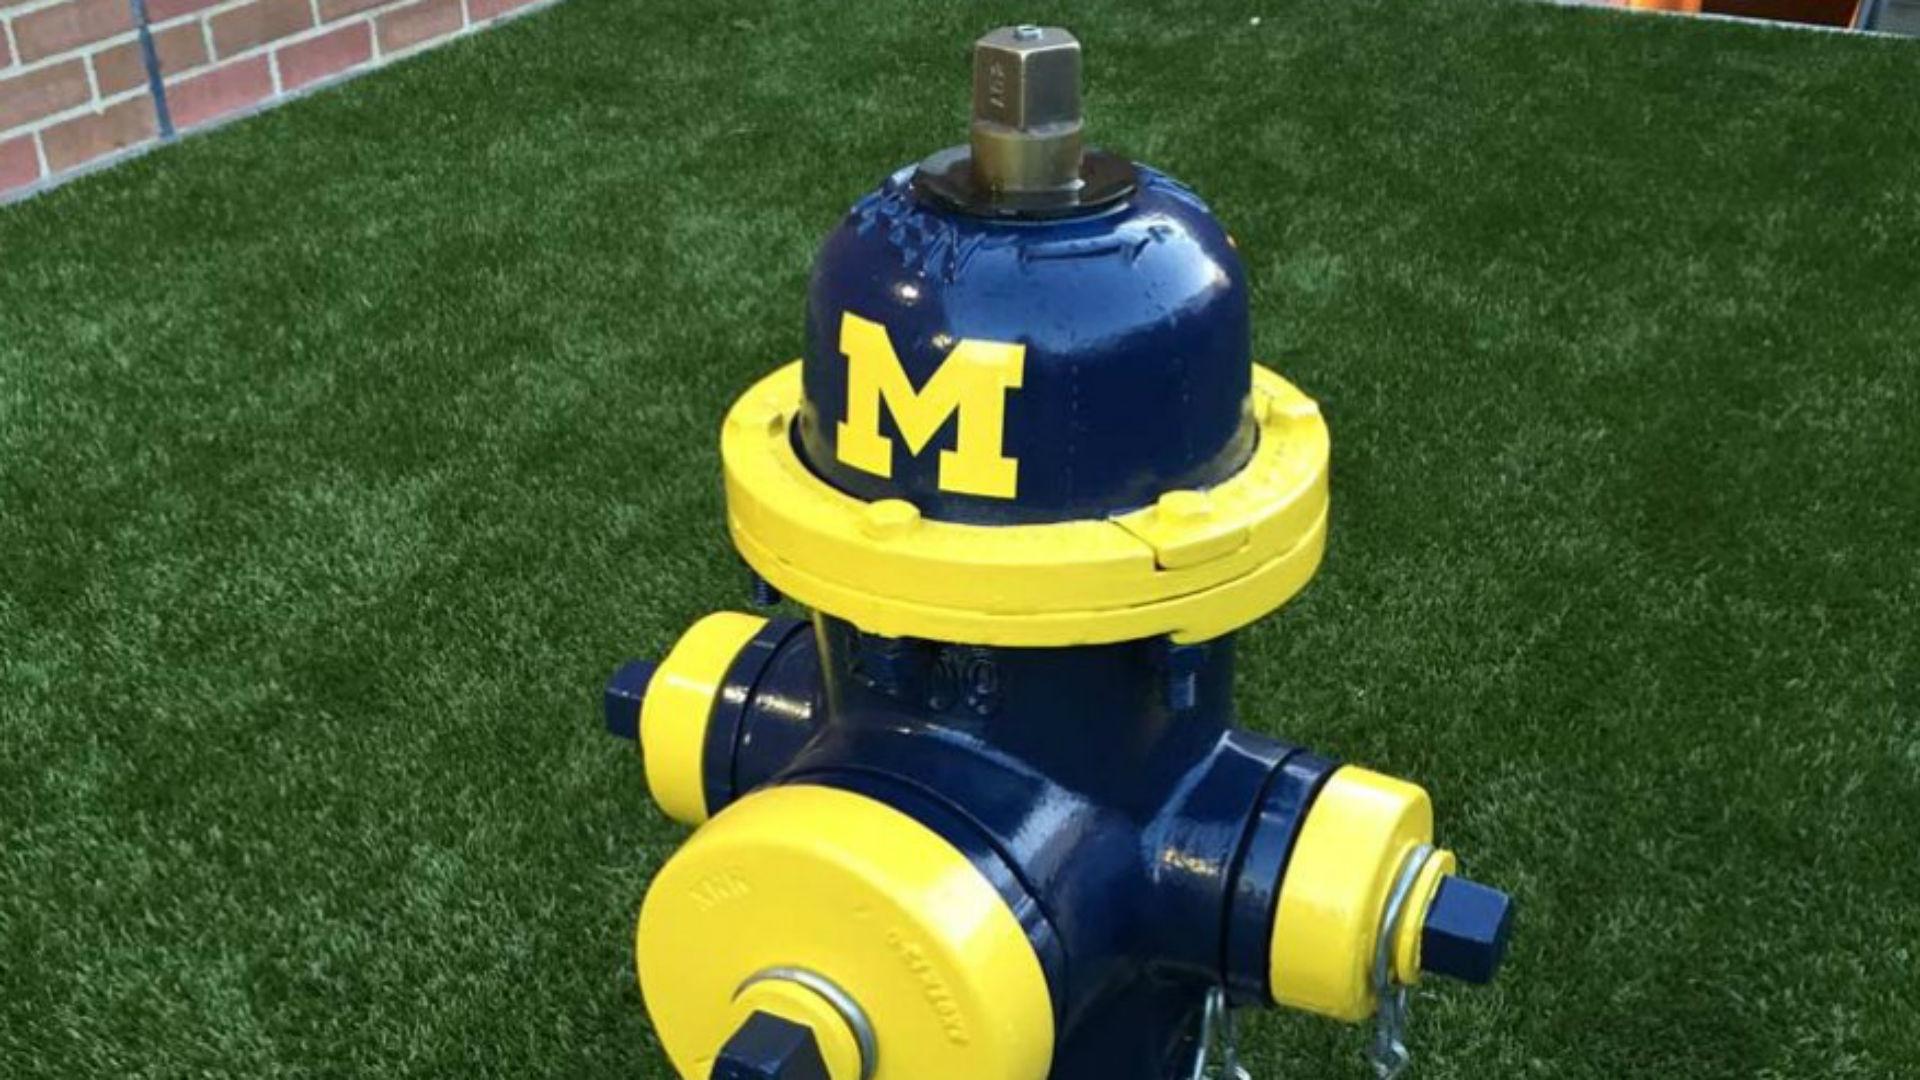 Ohio State's veterinary school has Michigan hydrants